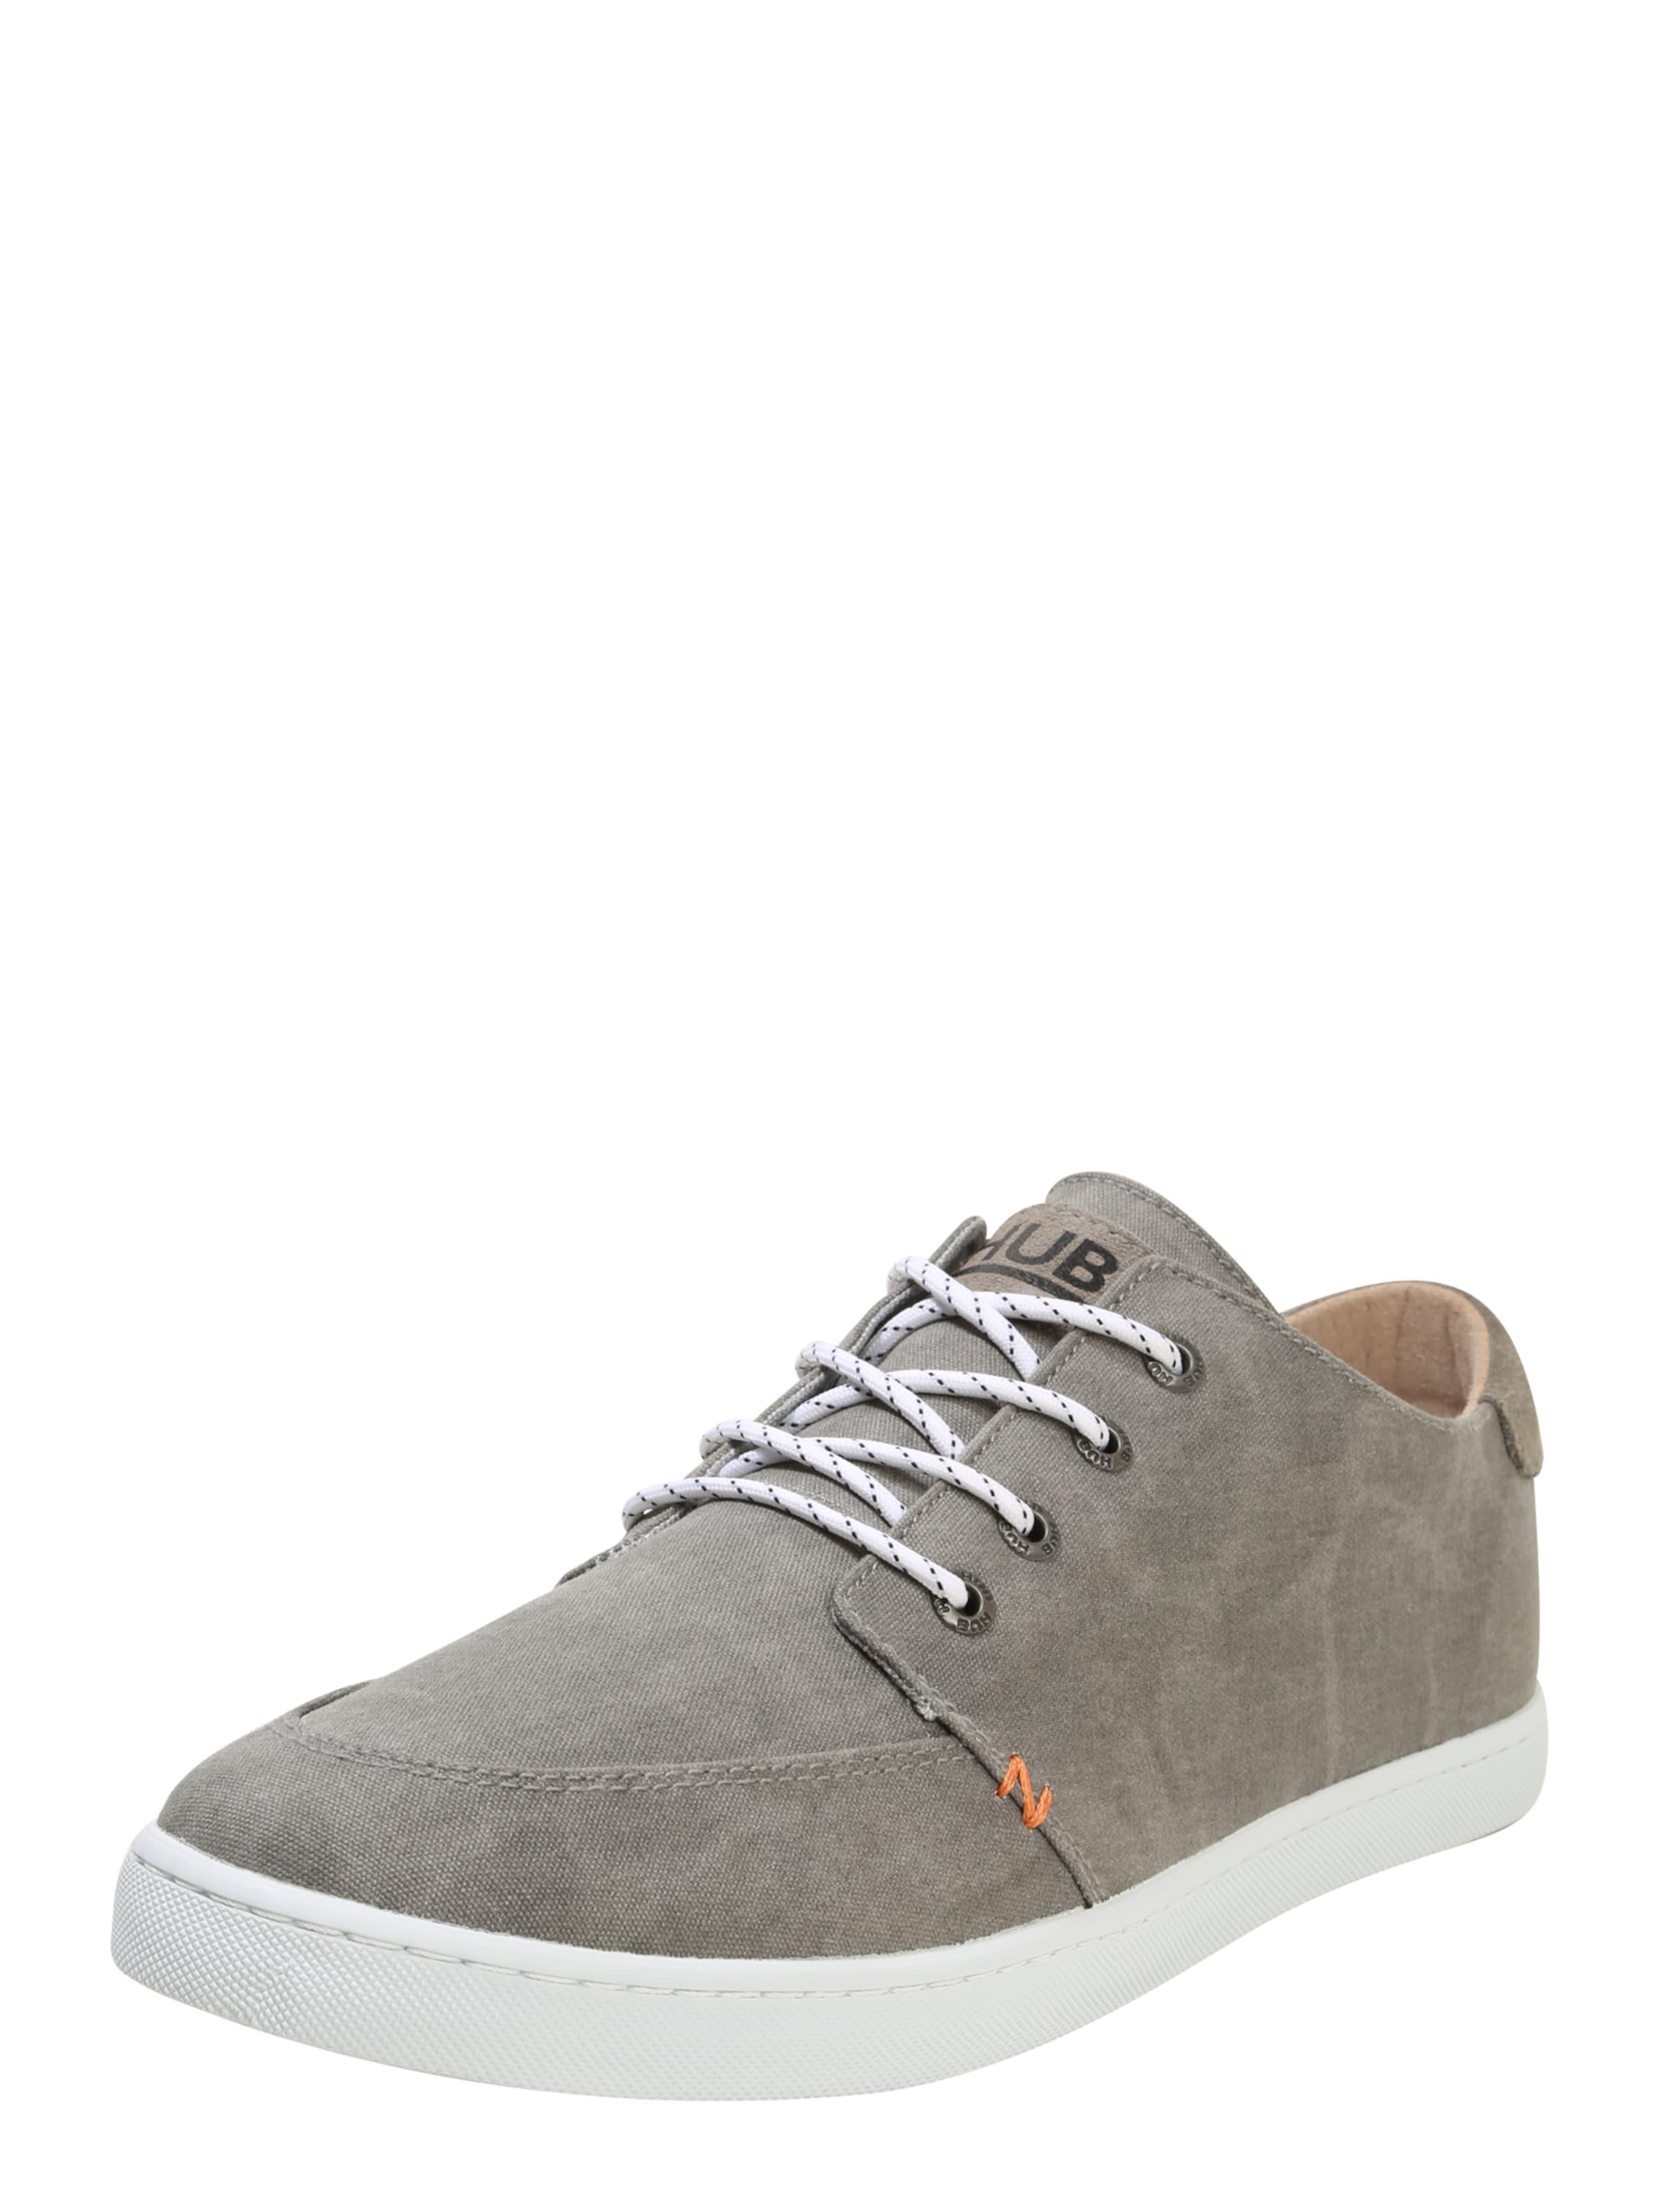 HUB Sneaker Boss Verschleißfeste billige Schuhe